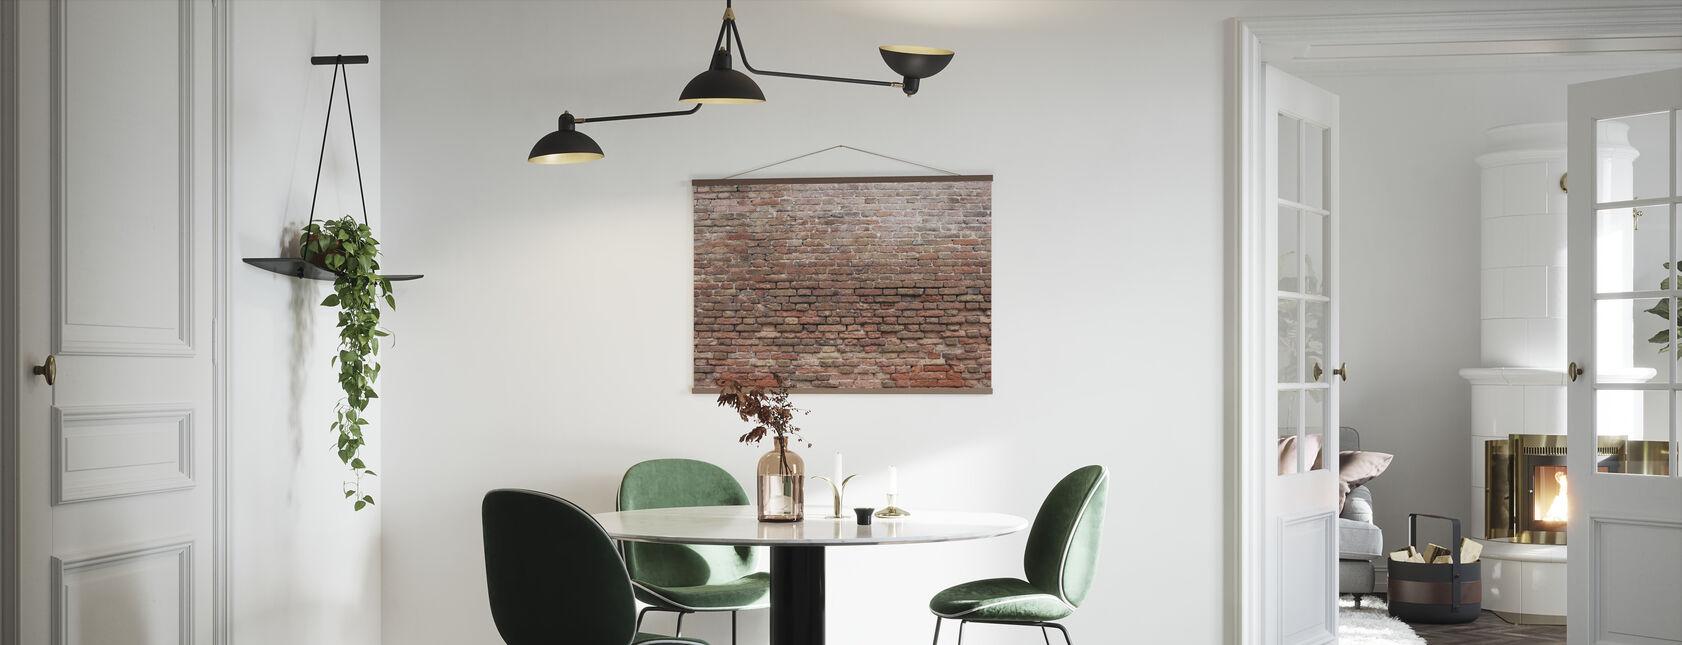 Dilapidated Brick Wall - Poster - Kitchen